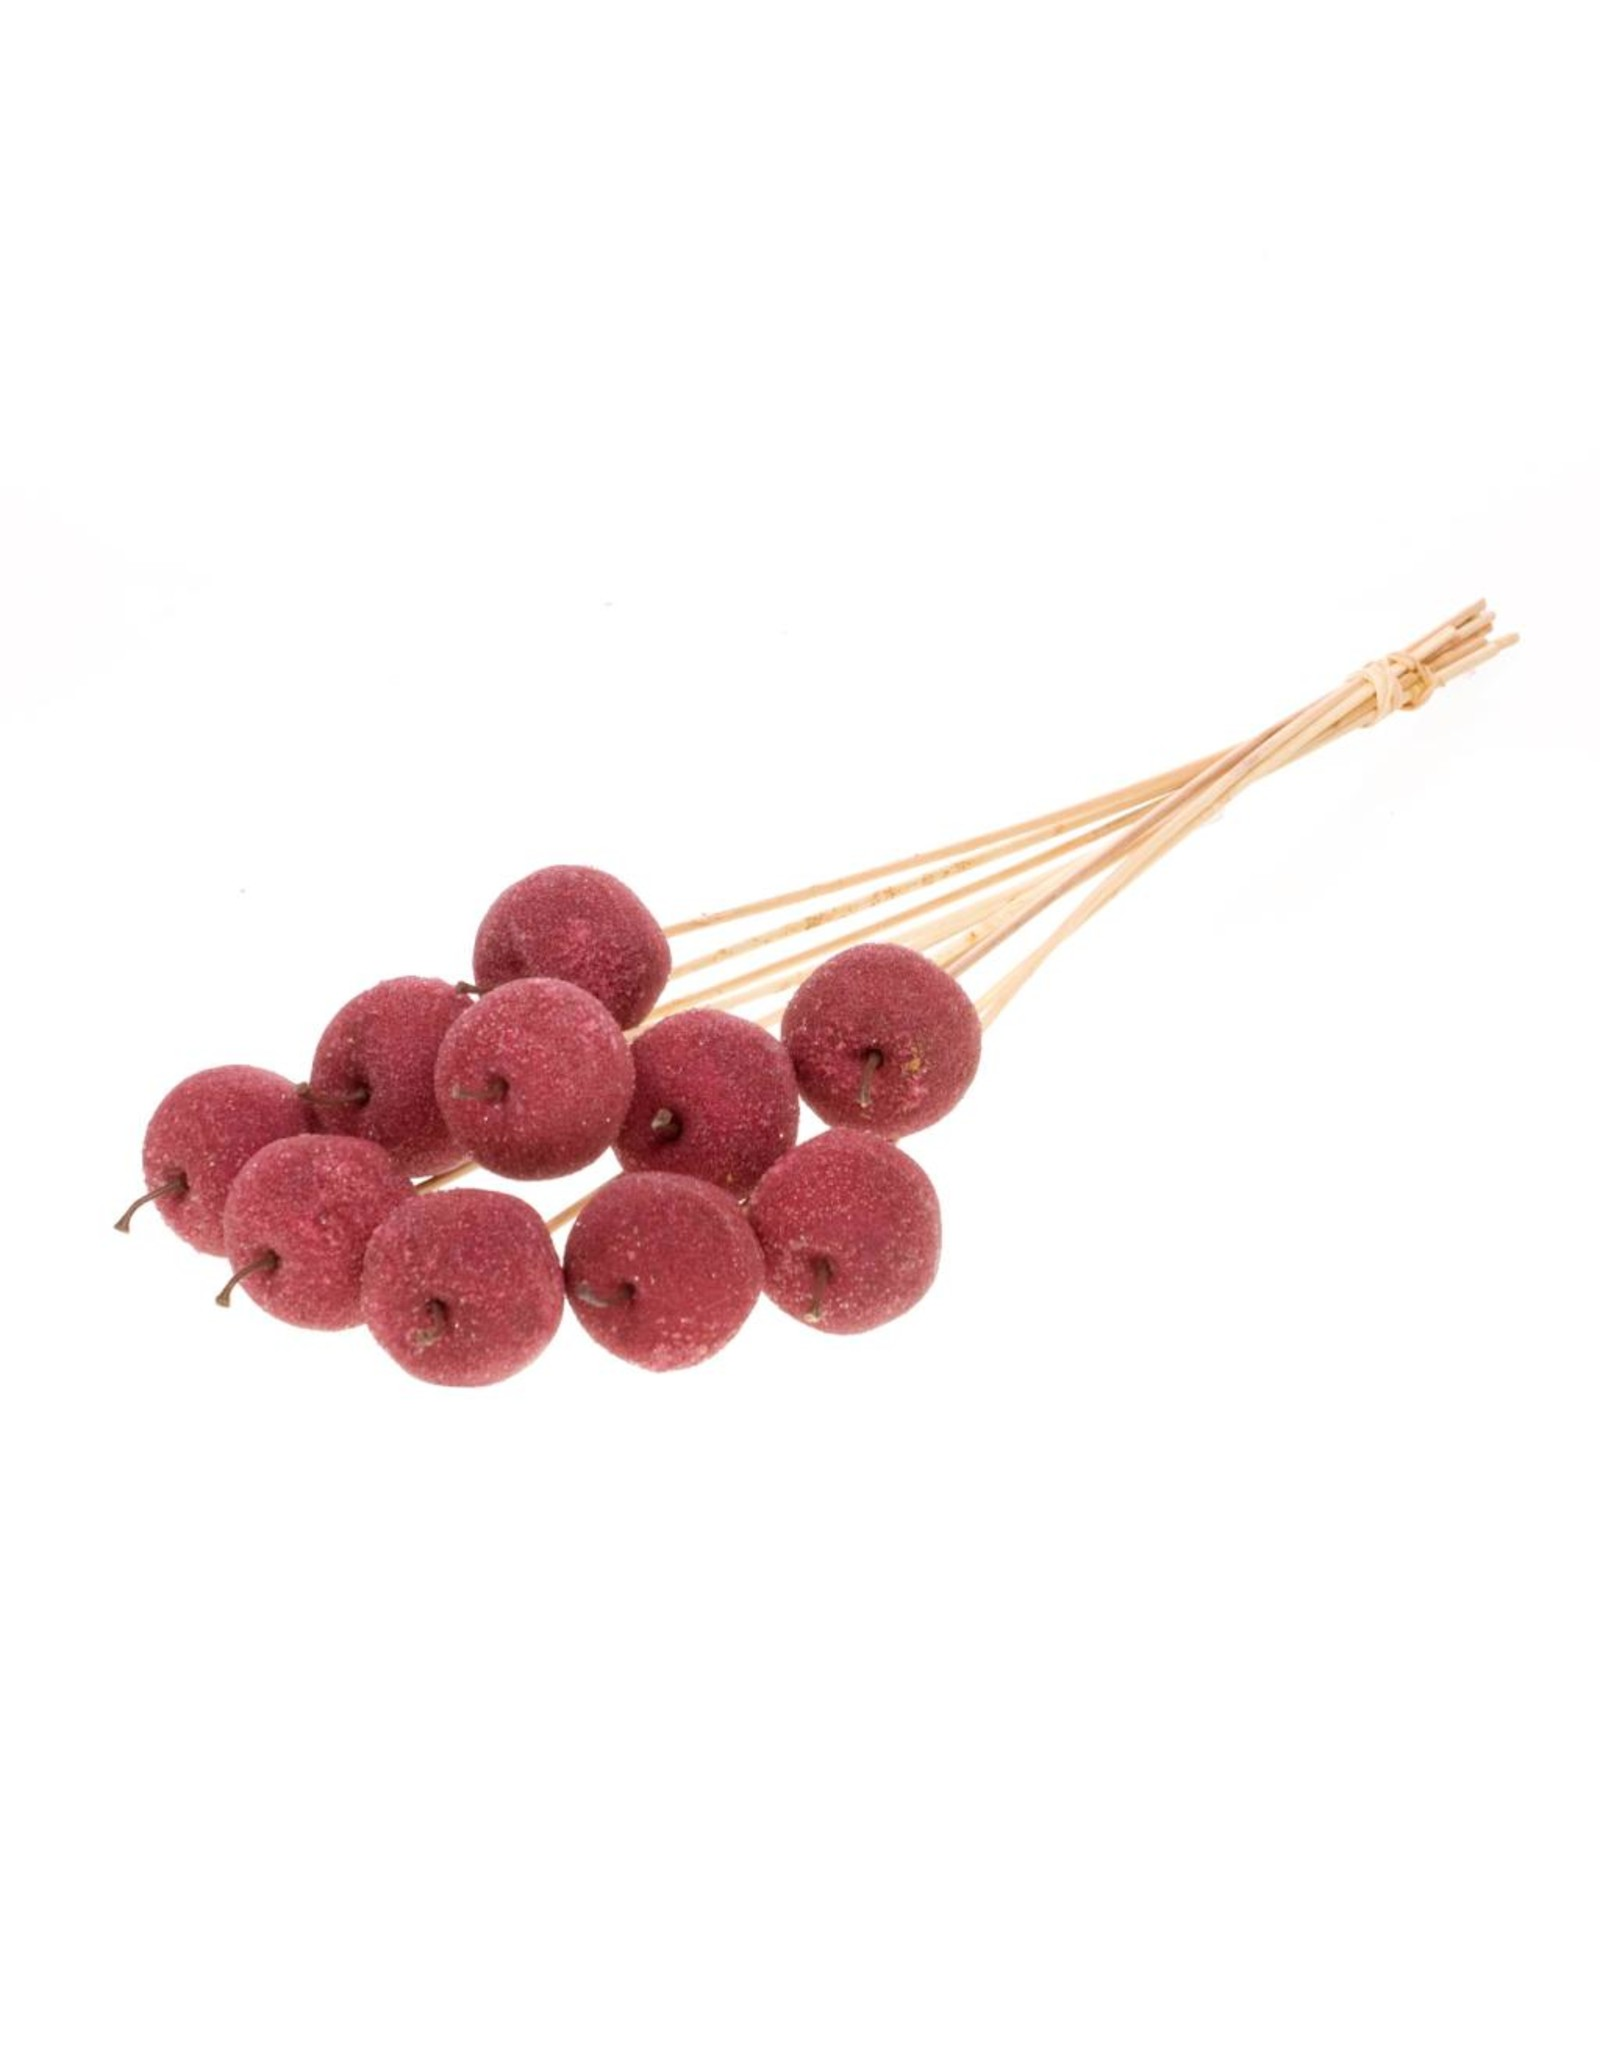 Apple sugar 5cm o/s 10pc red spring x 20